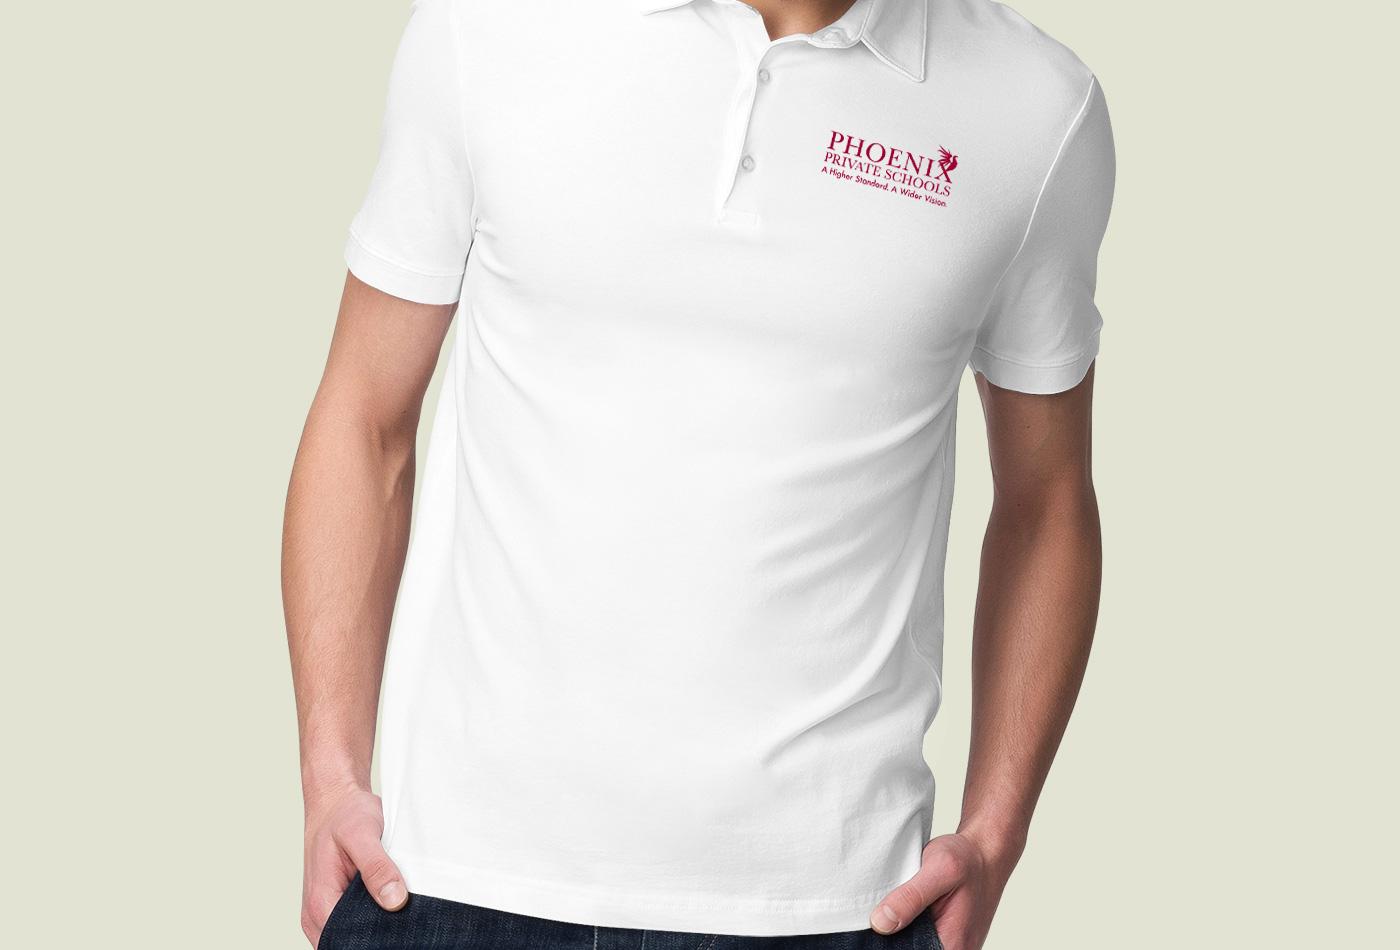 Shirt Design - Marketing